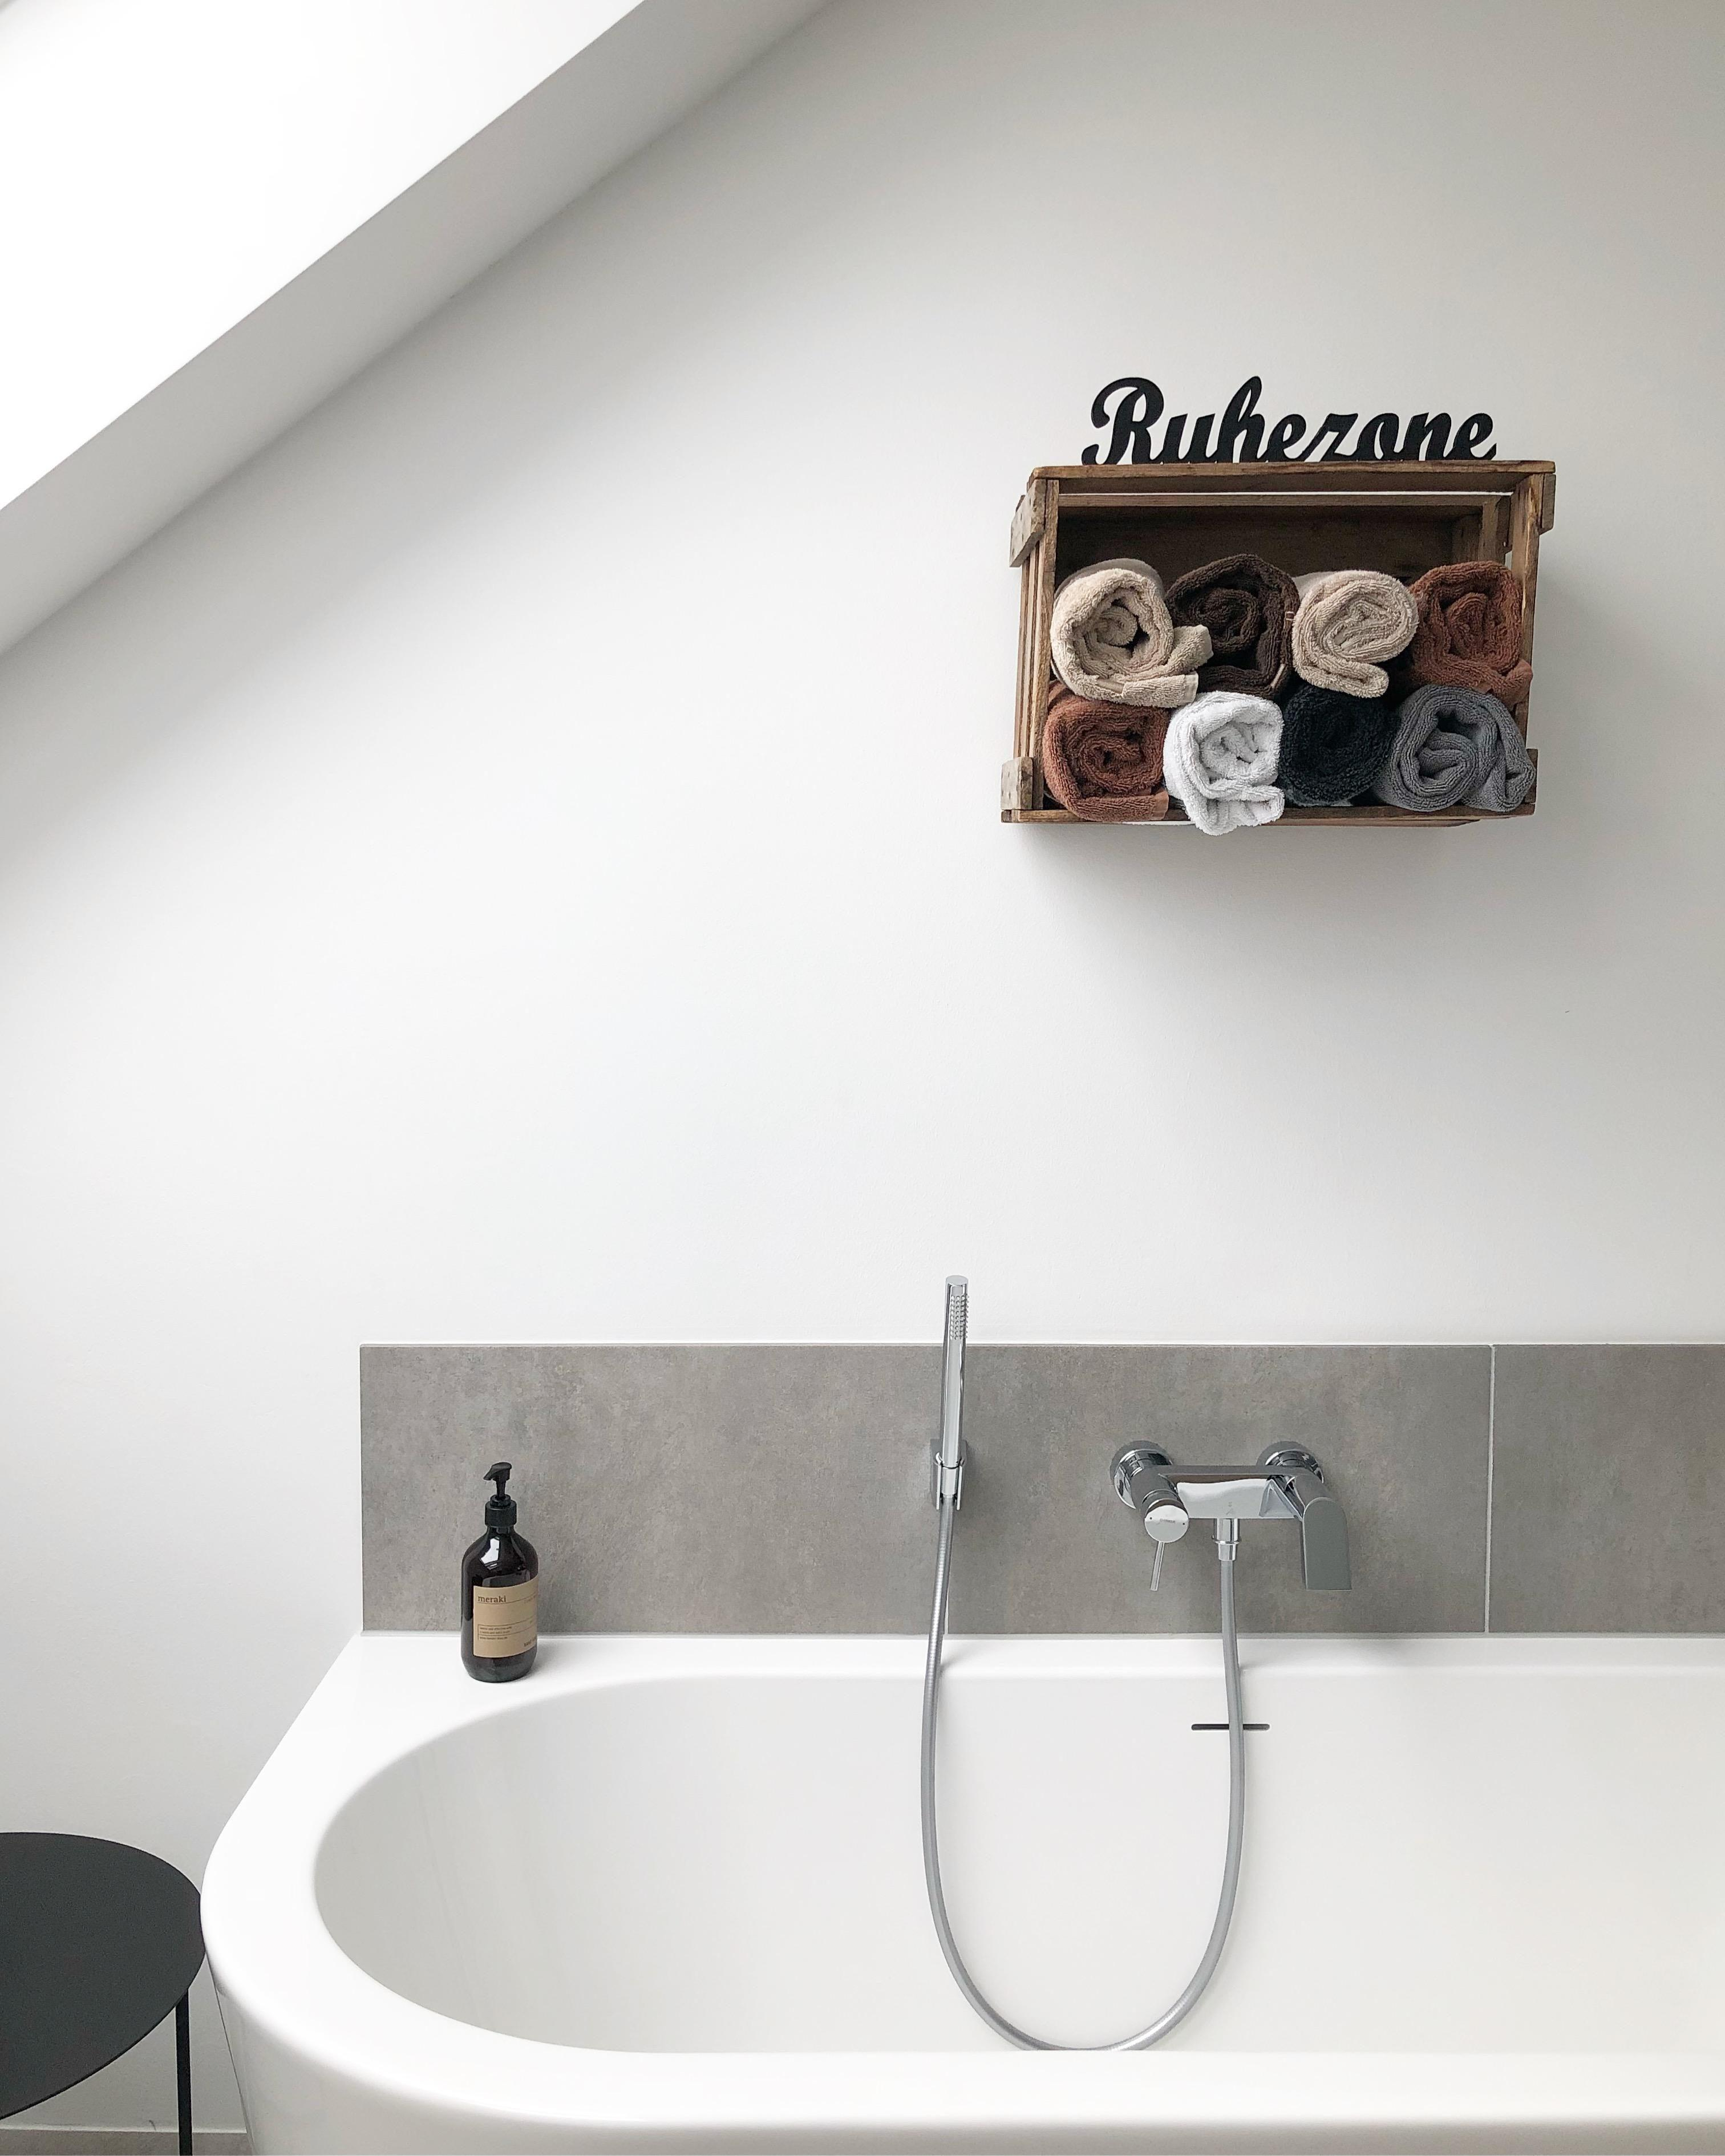 Schon Auszeit Badewanne Wanne Badezimmer Ruhezone Dachschraege Holzkiste E2d643c5  1a4d 46da 8ec8 4b60bdda5b9d